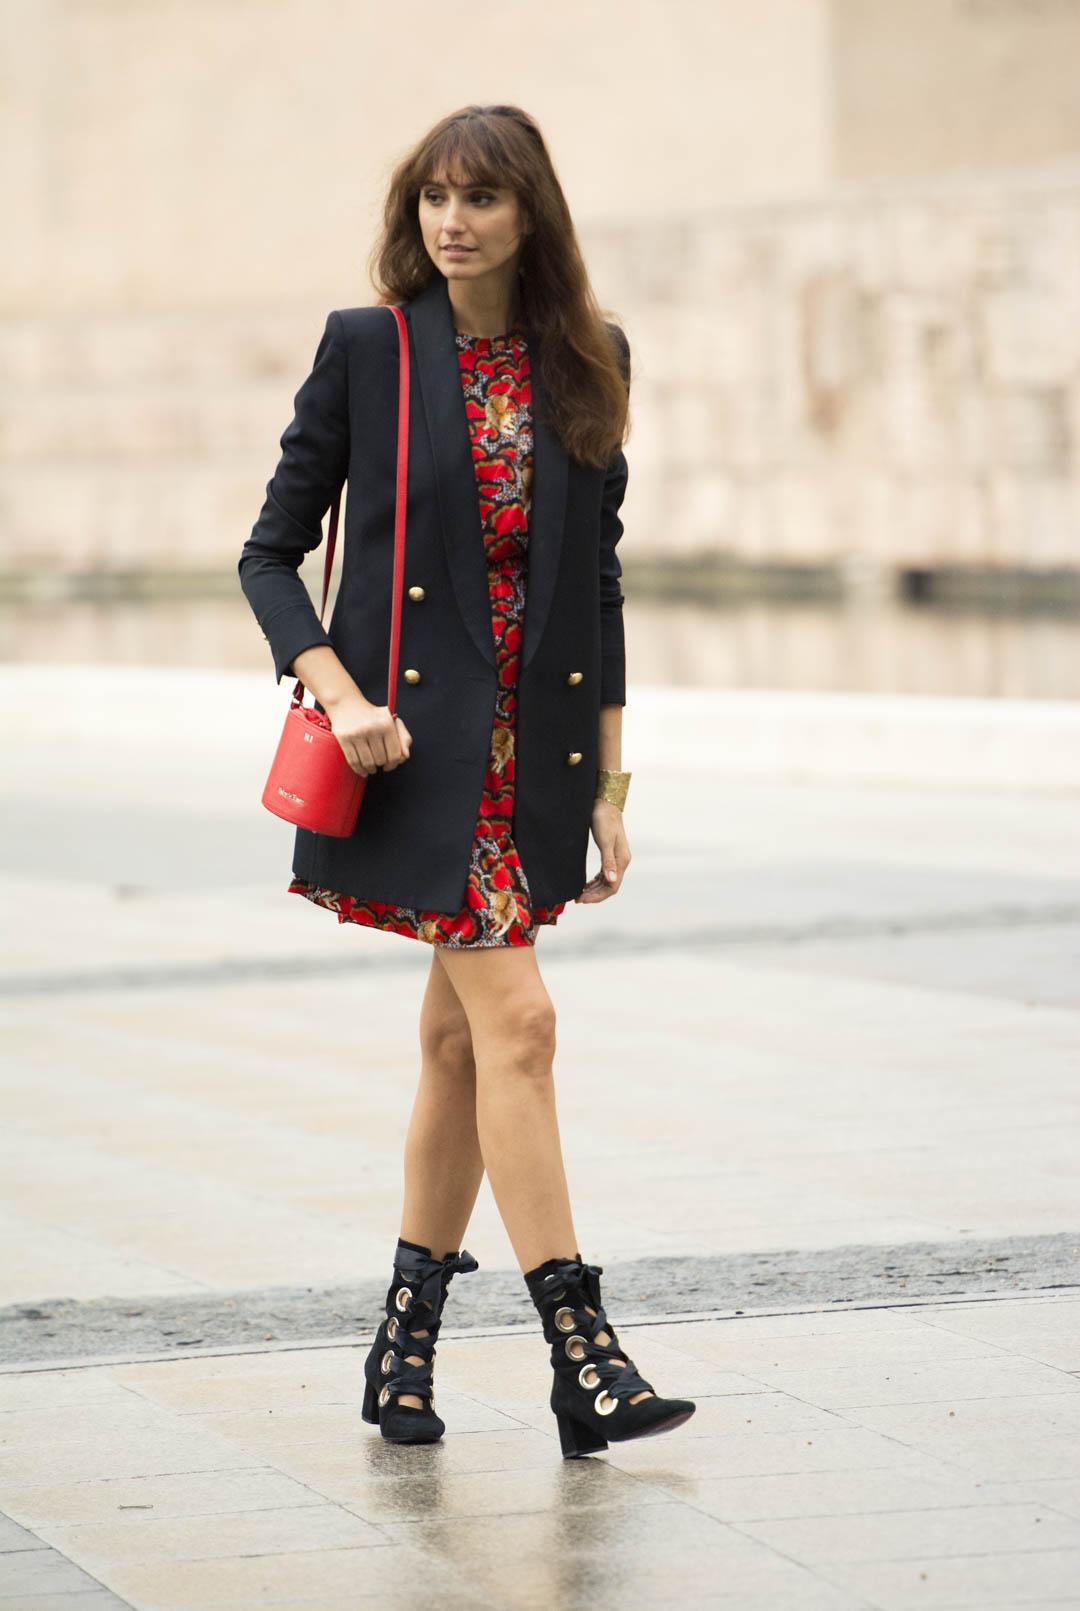 sandro-red-dress-mitmeblog-street-style-mayte-de-la-iglesia-web-01